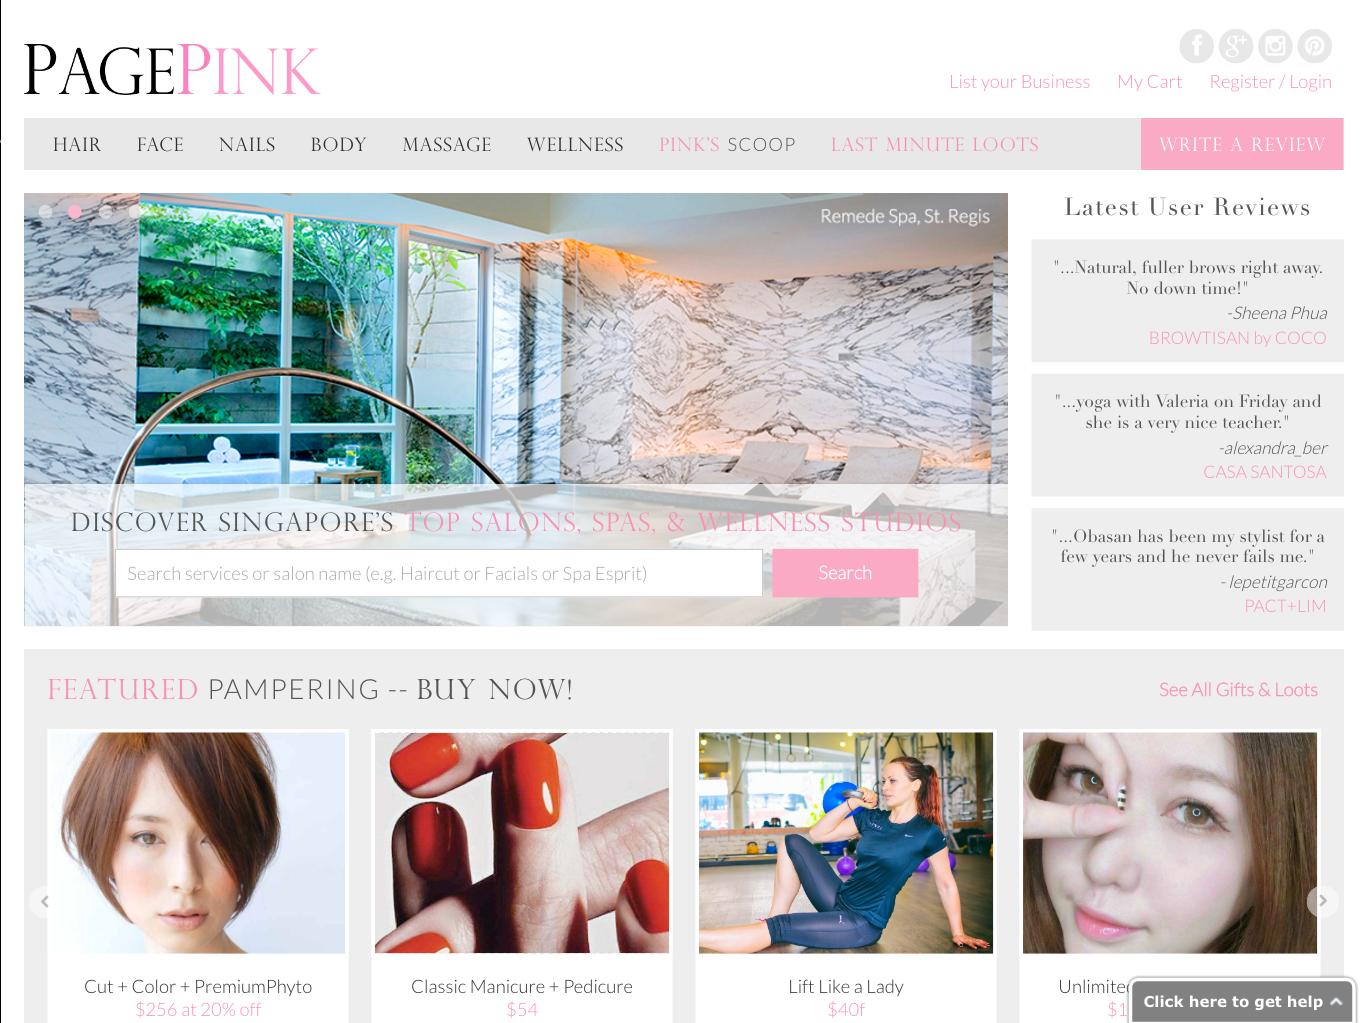 pagepink.com